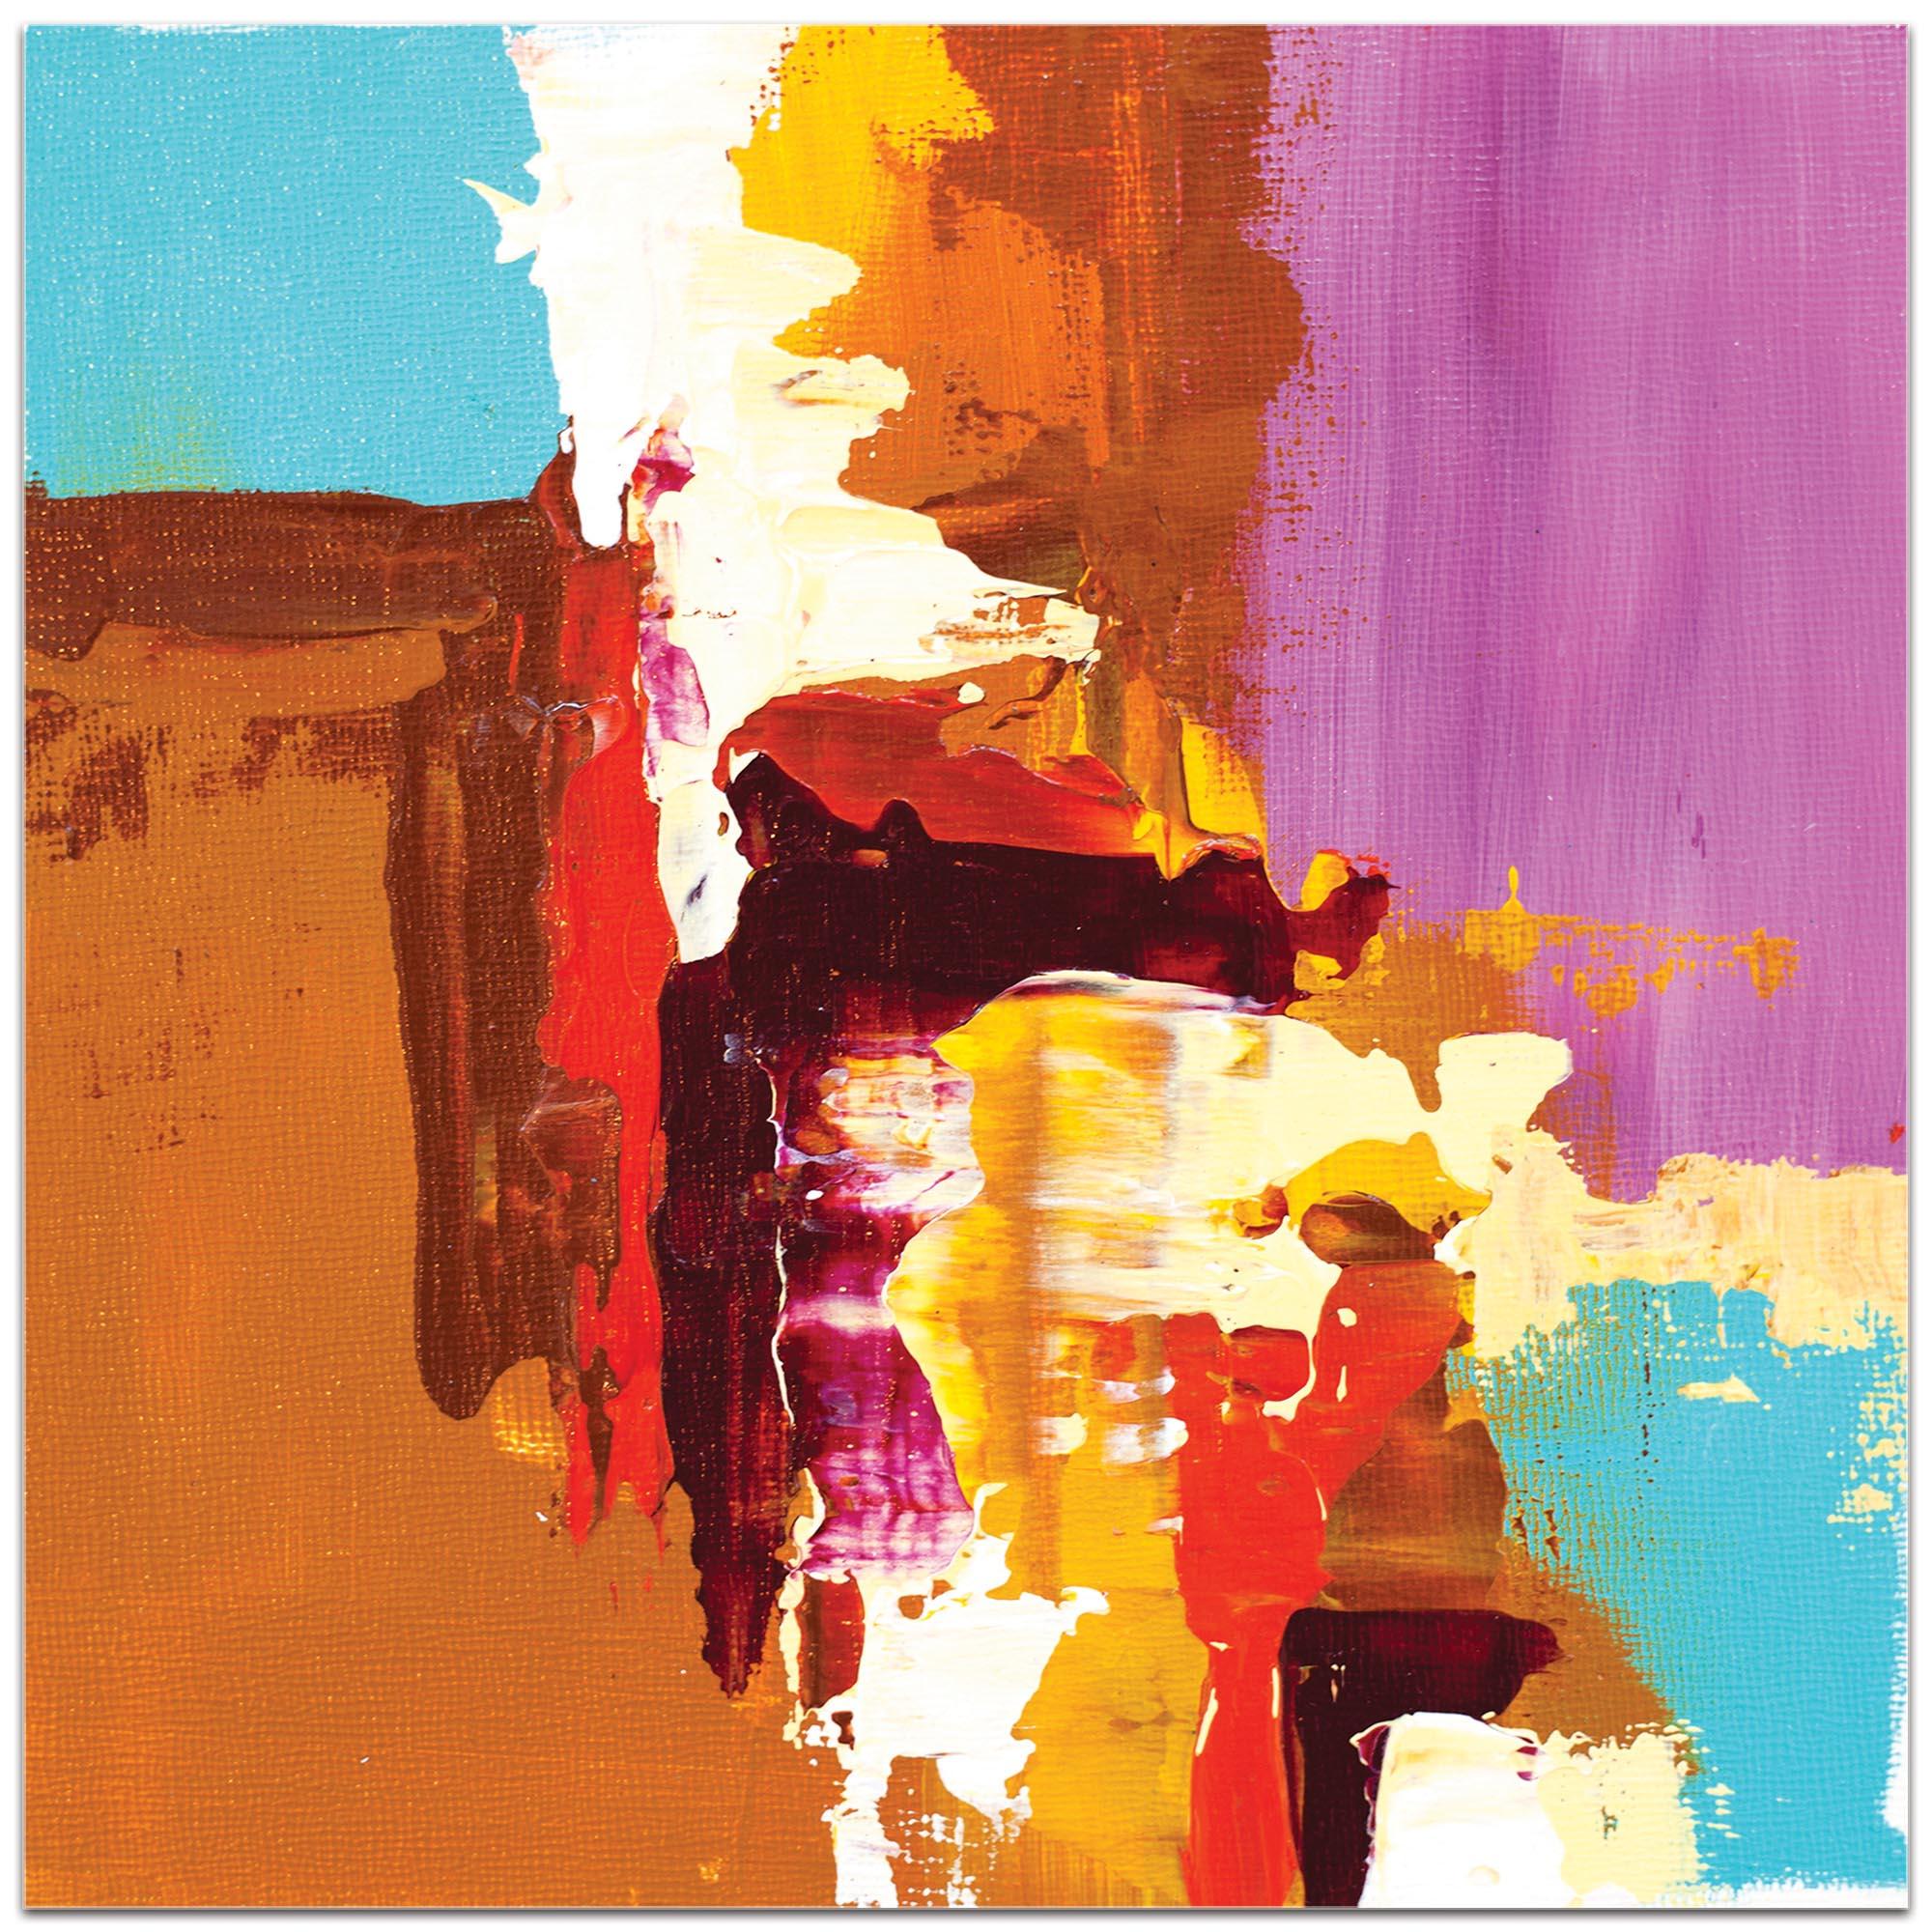 Abstract Wall Art 'Urban Life 12' - Urban Decor on Metal or Plexiglass - Image 2